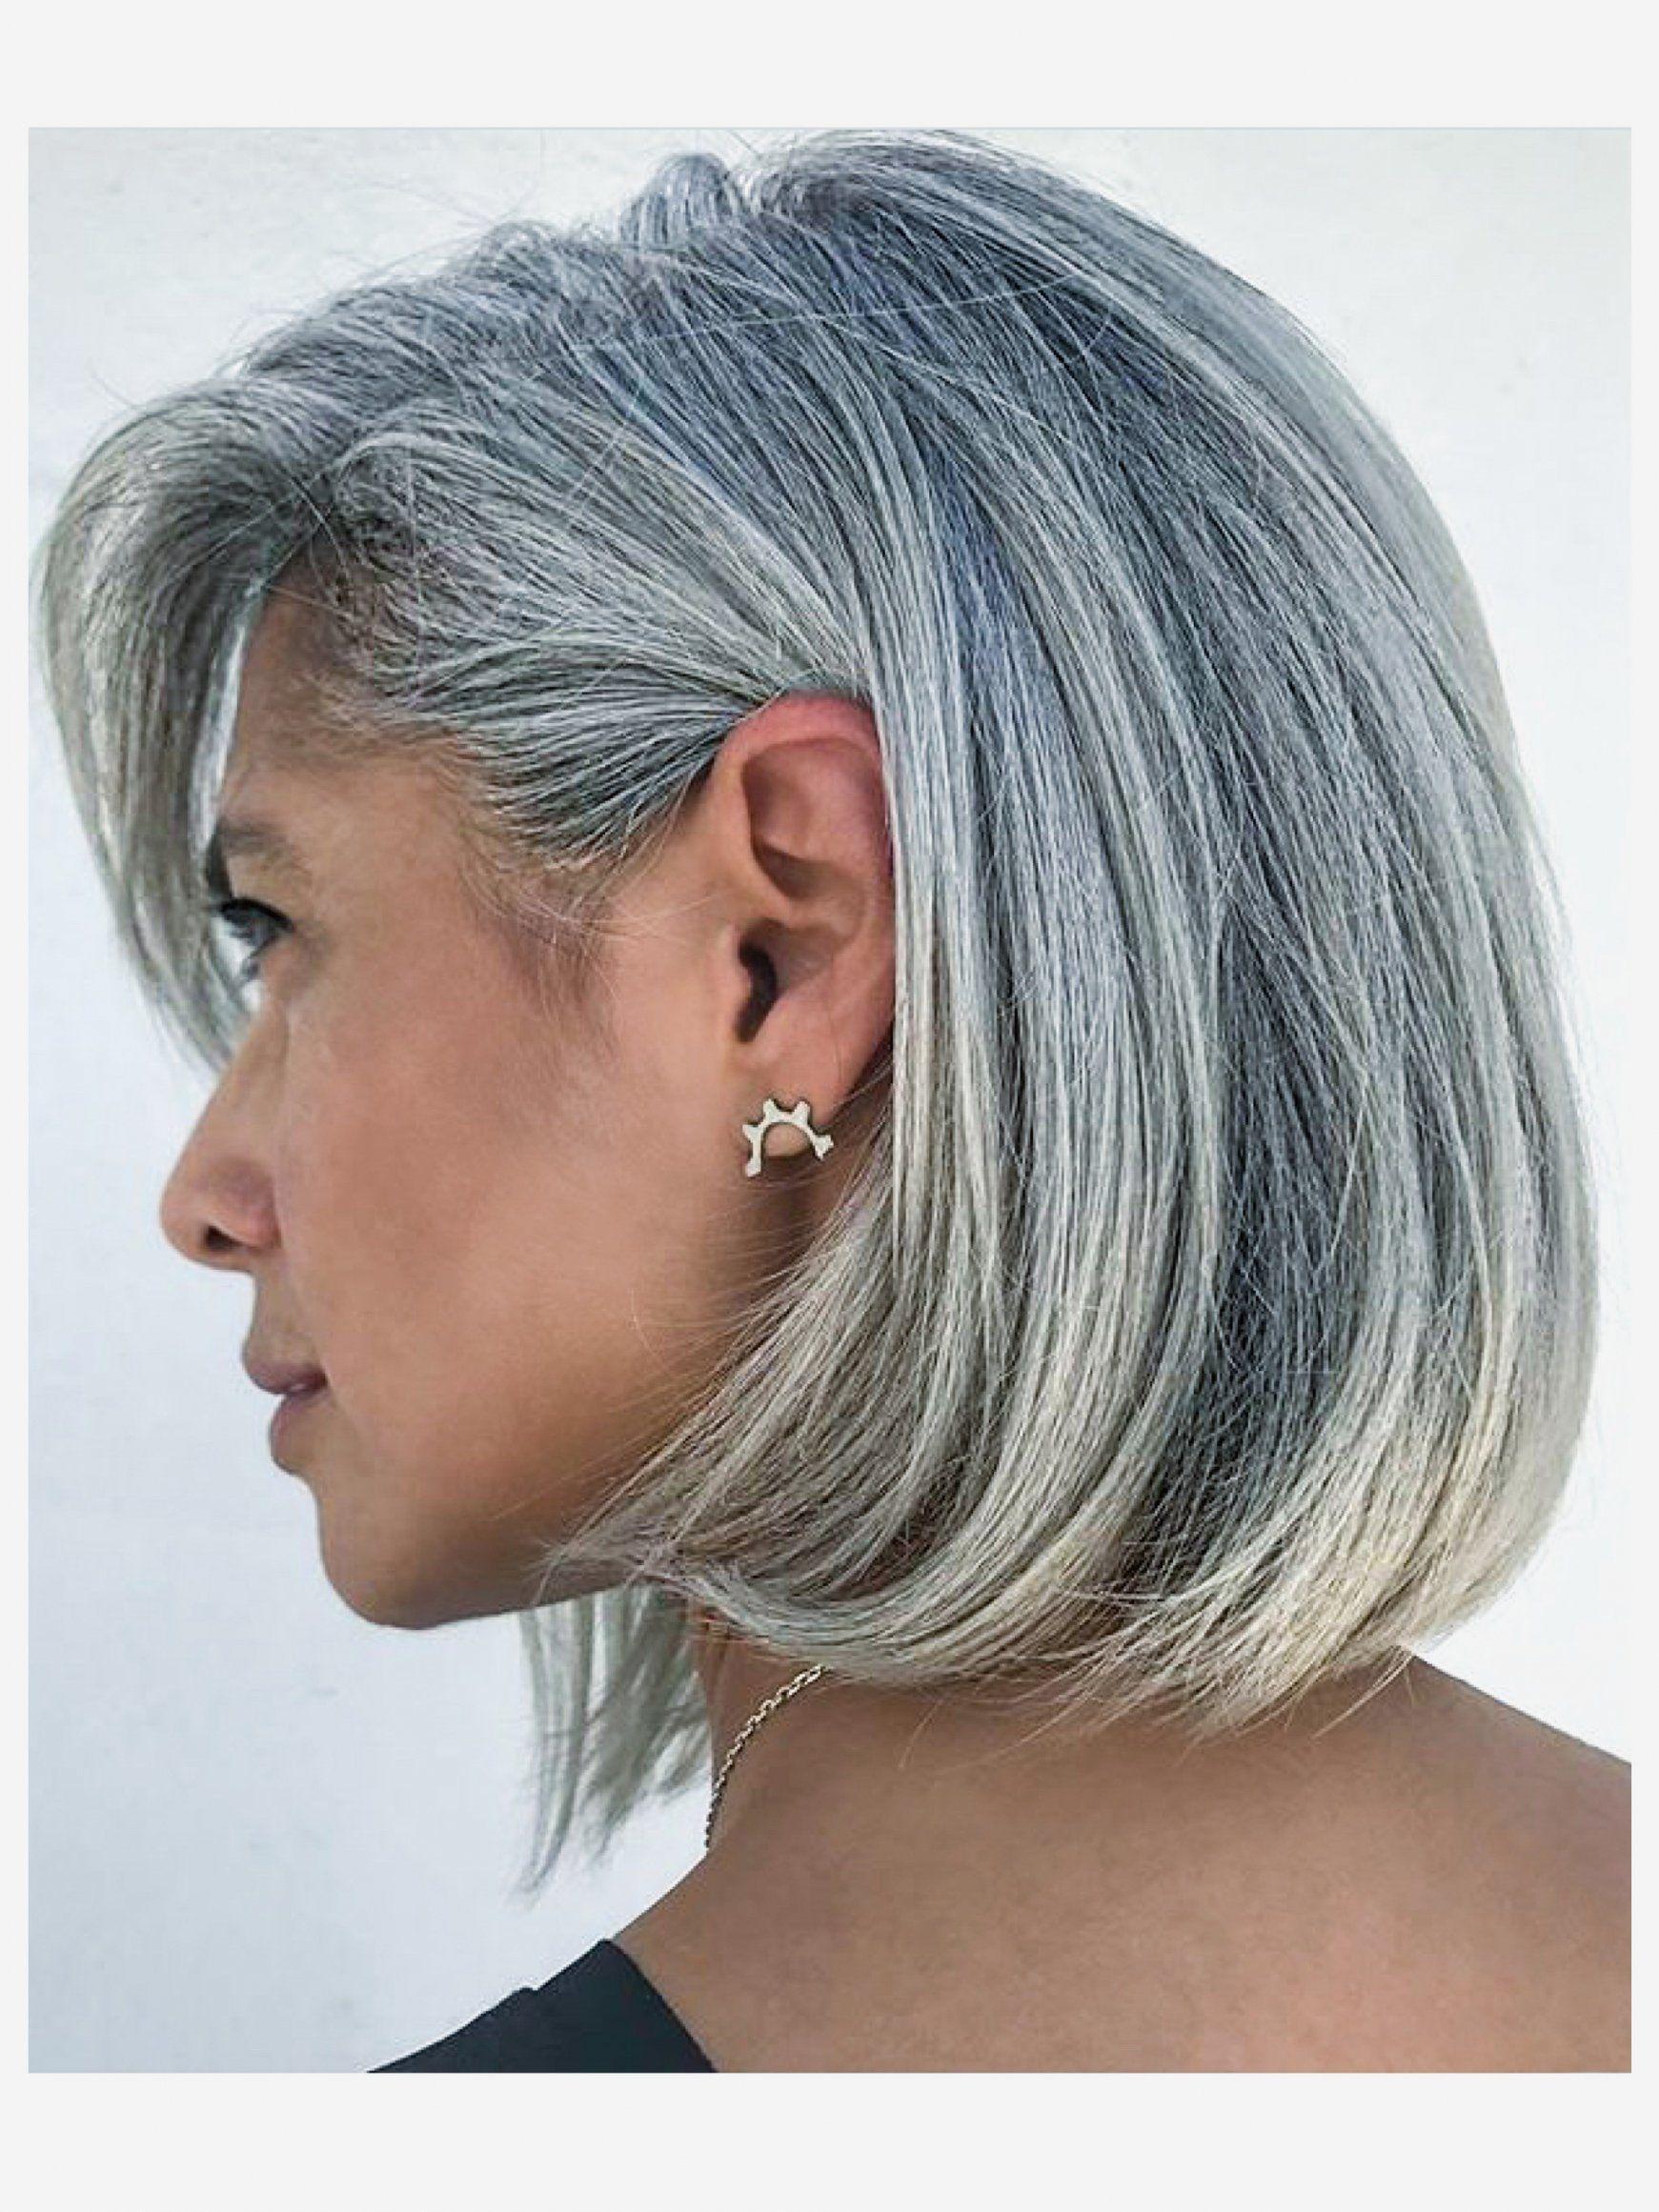 Short Hairstyles Fresh Short Hairstyles For Thick Grey Hair New Long Gray Hair Grey Hair Color Hair Styles